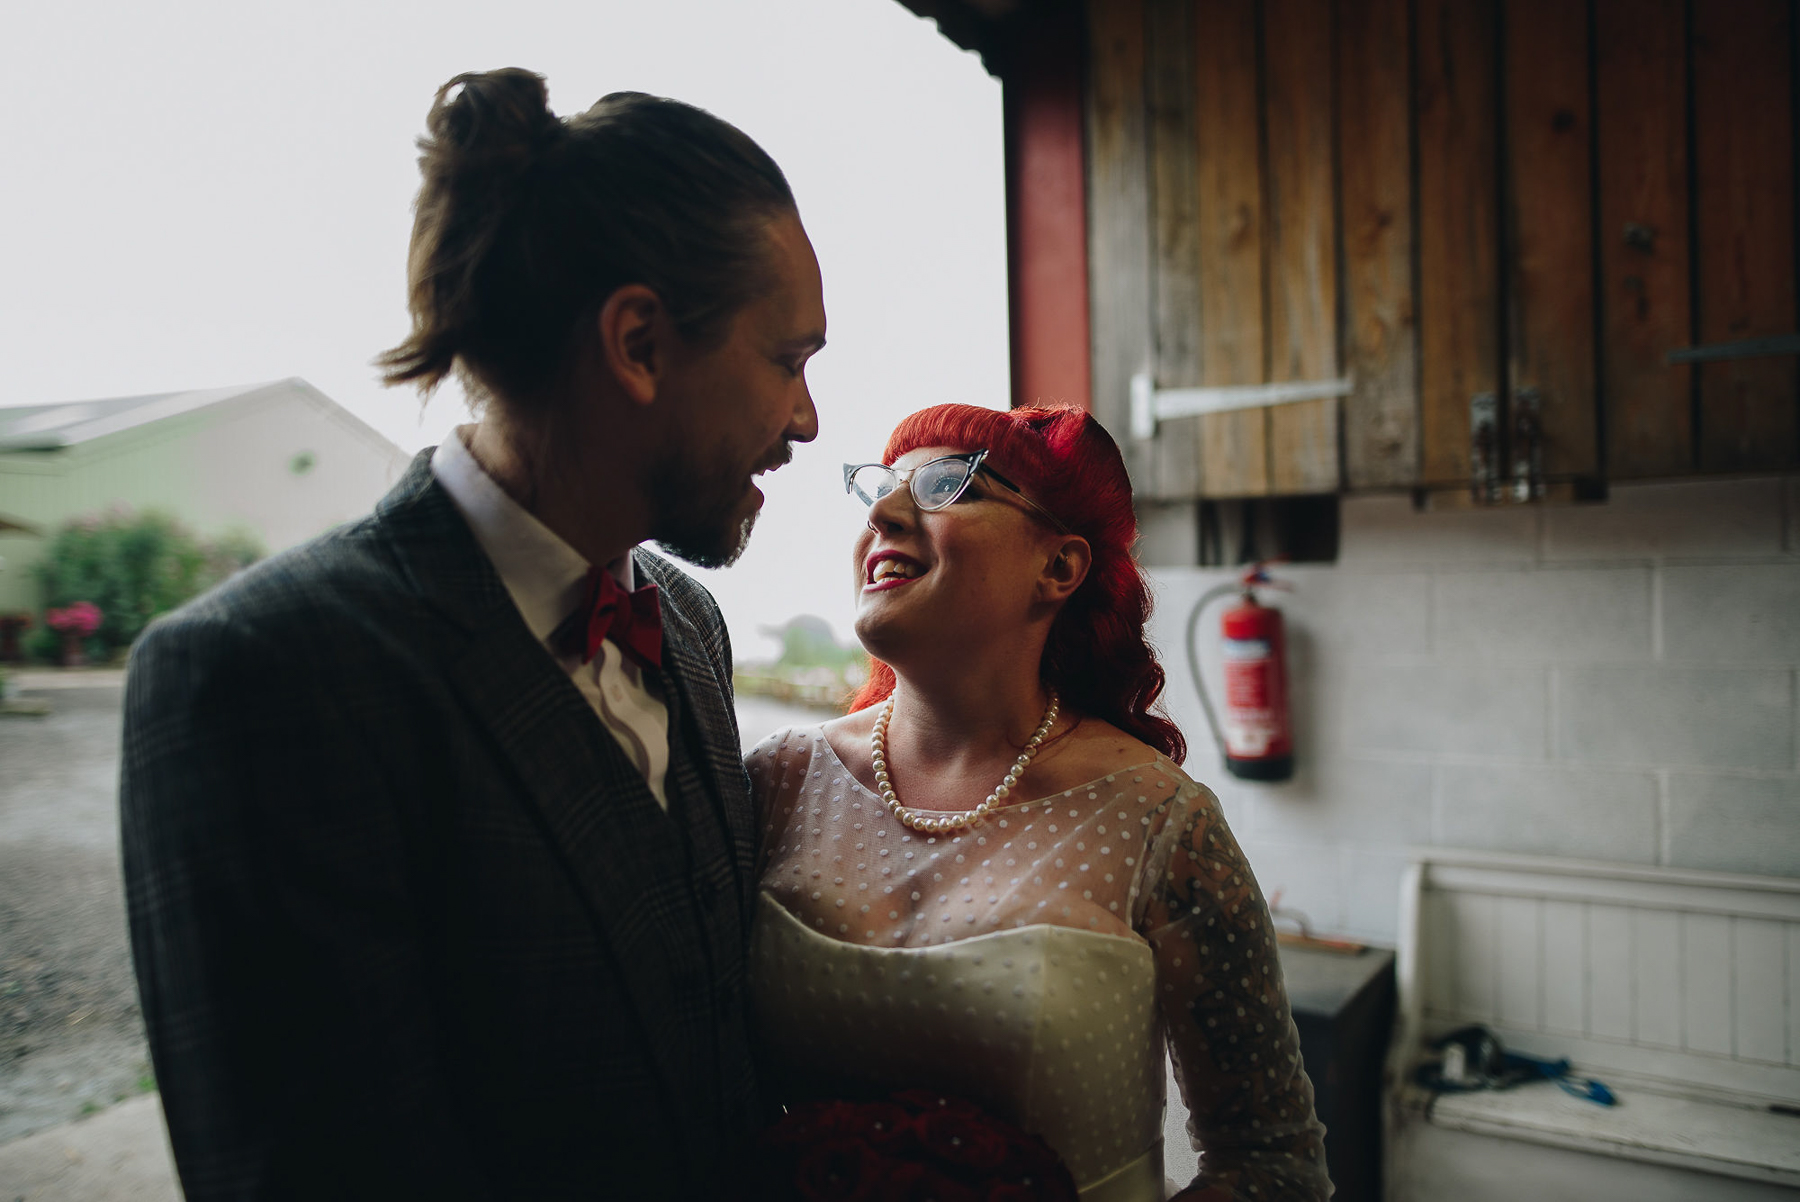 Wellbeing_Farm_Wedding_Photography_The_Pin-Up_Bride_Lara_Shaun-84.jpg